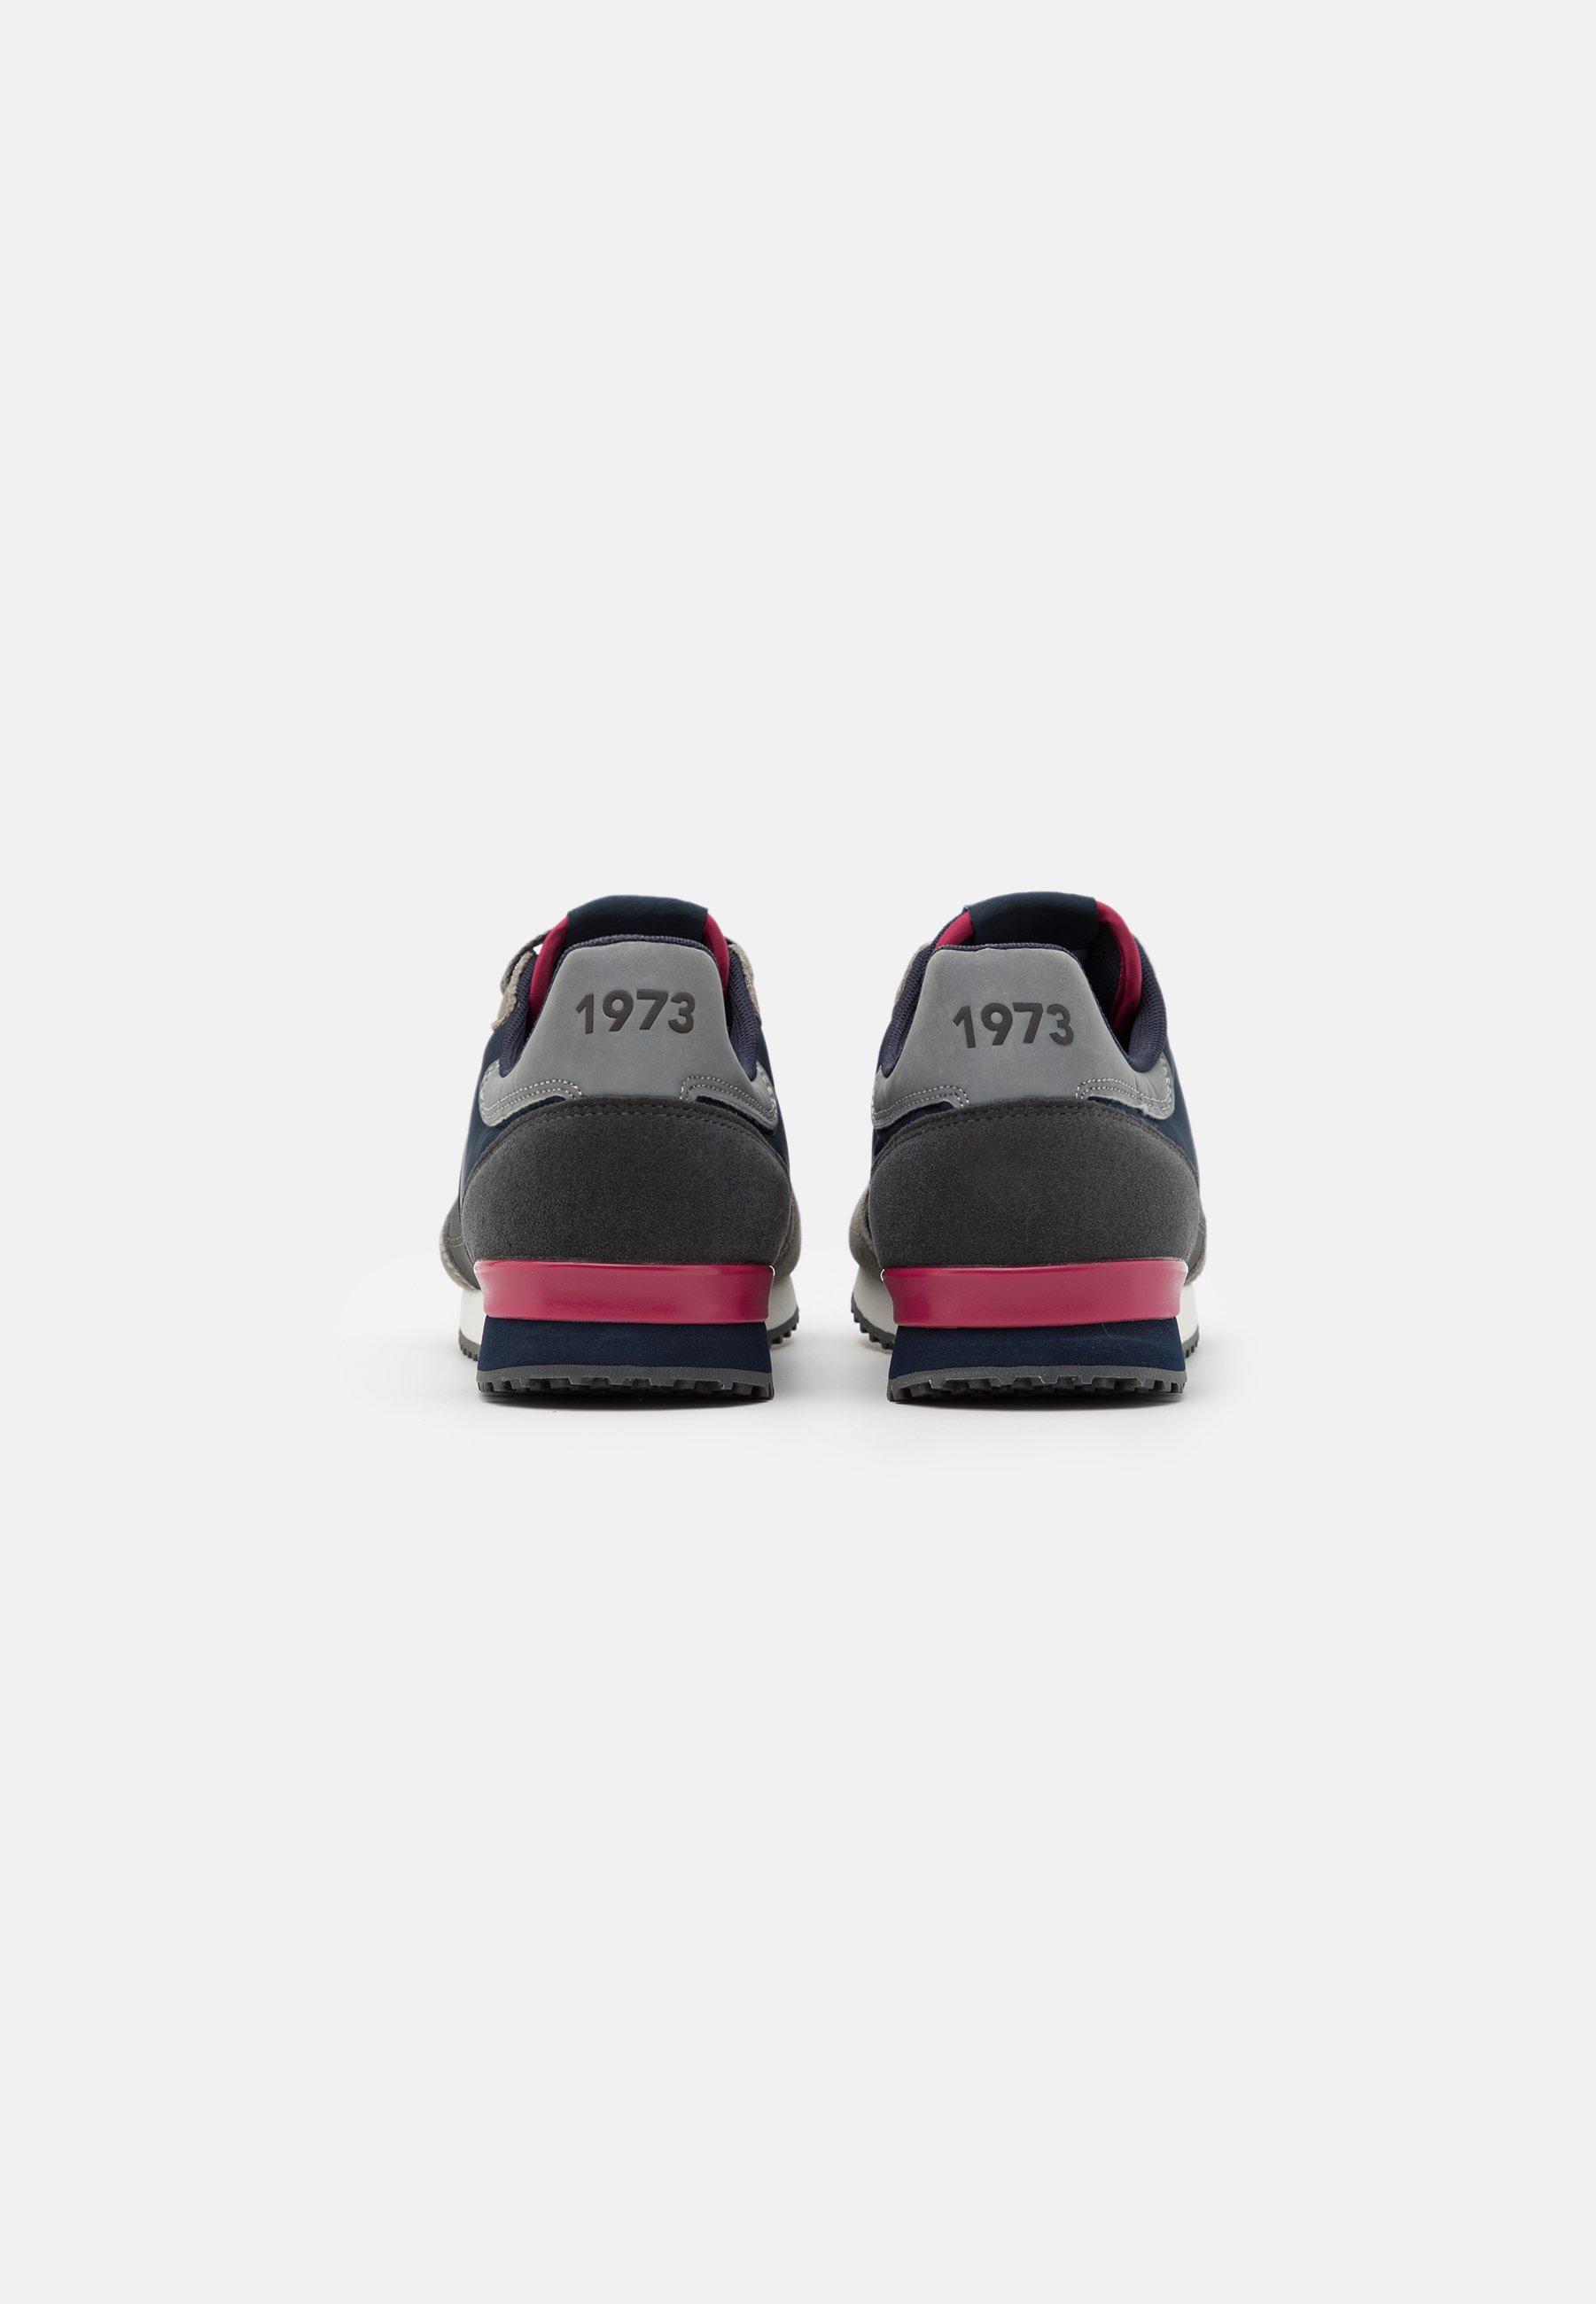 Pepe Jeans TINKER SECOND - Sneaker low - grey/grau - Herrenschuhe uy5V5